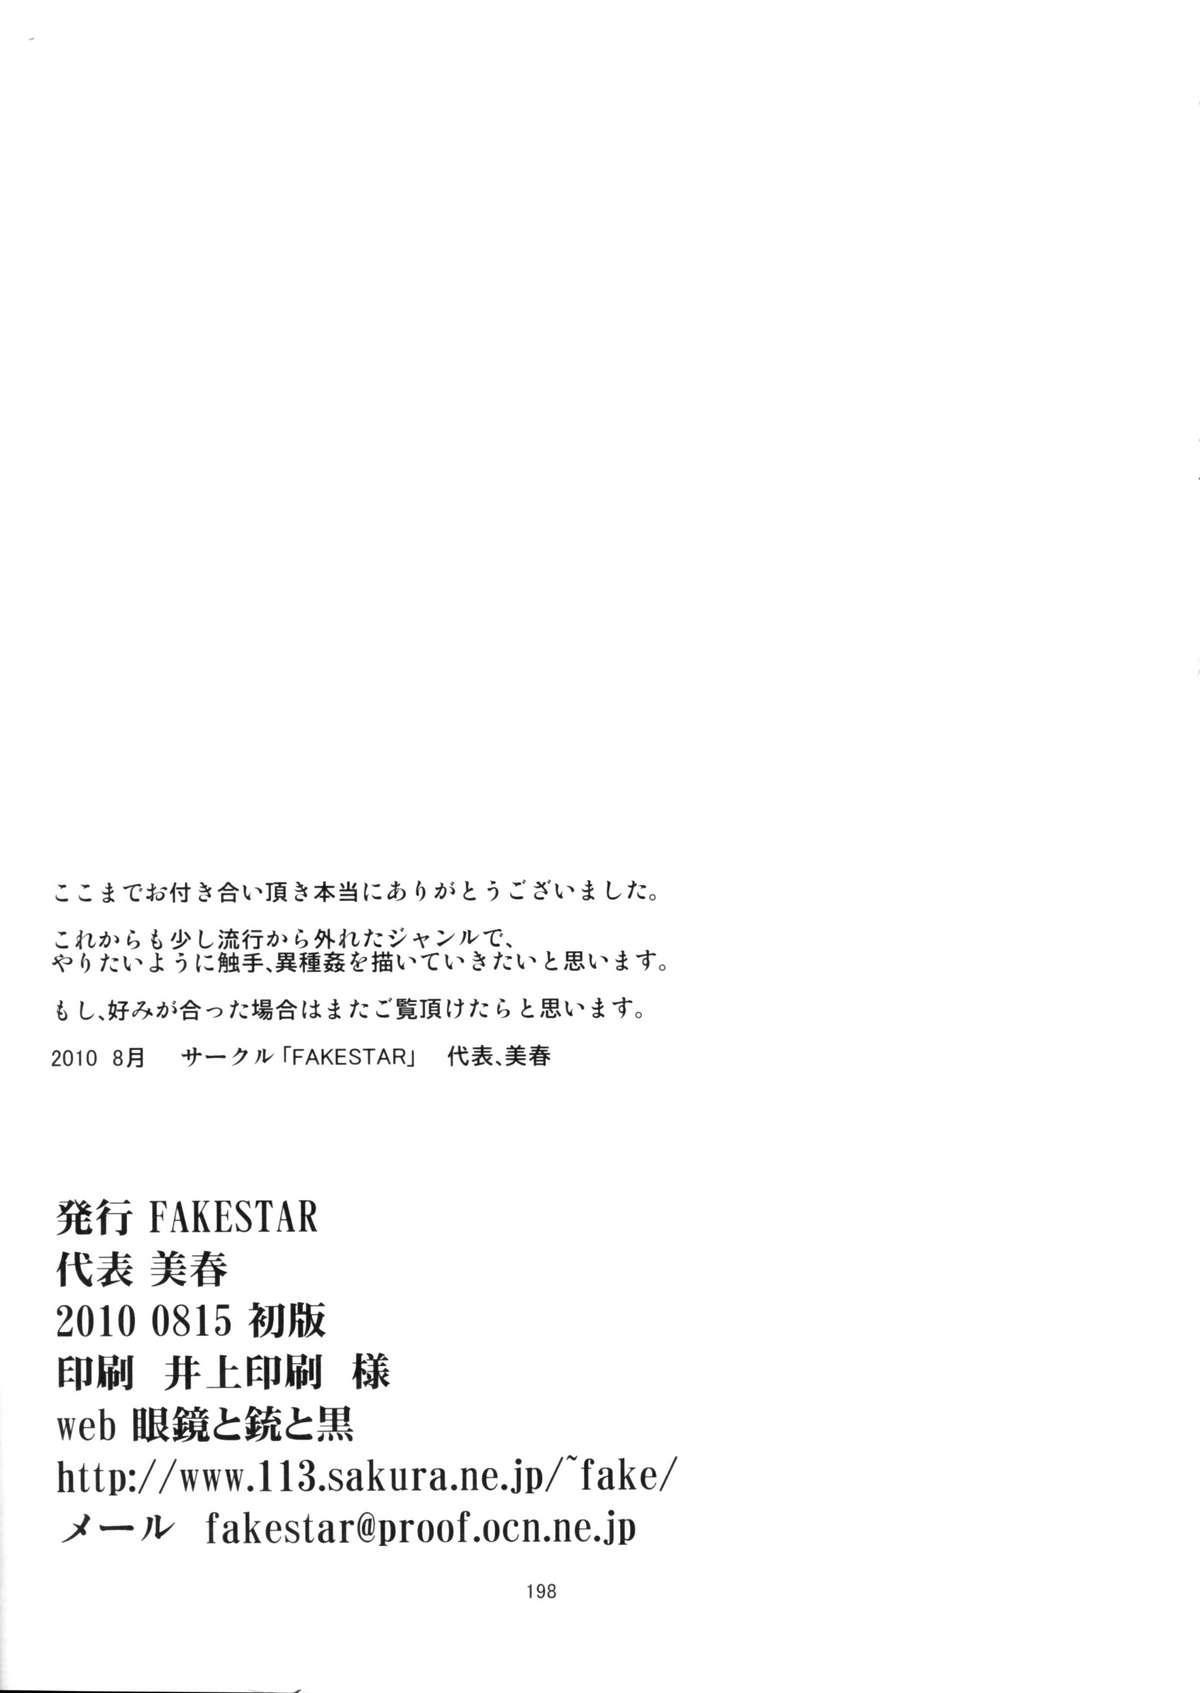 FD 194